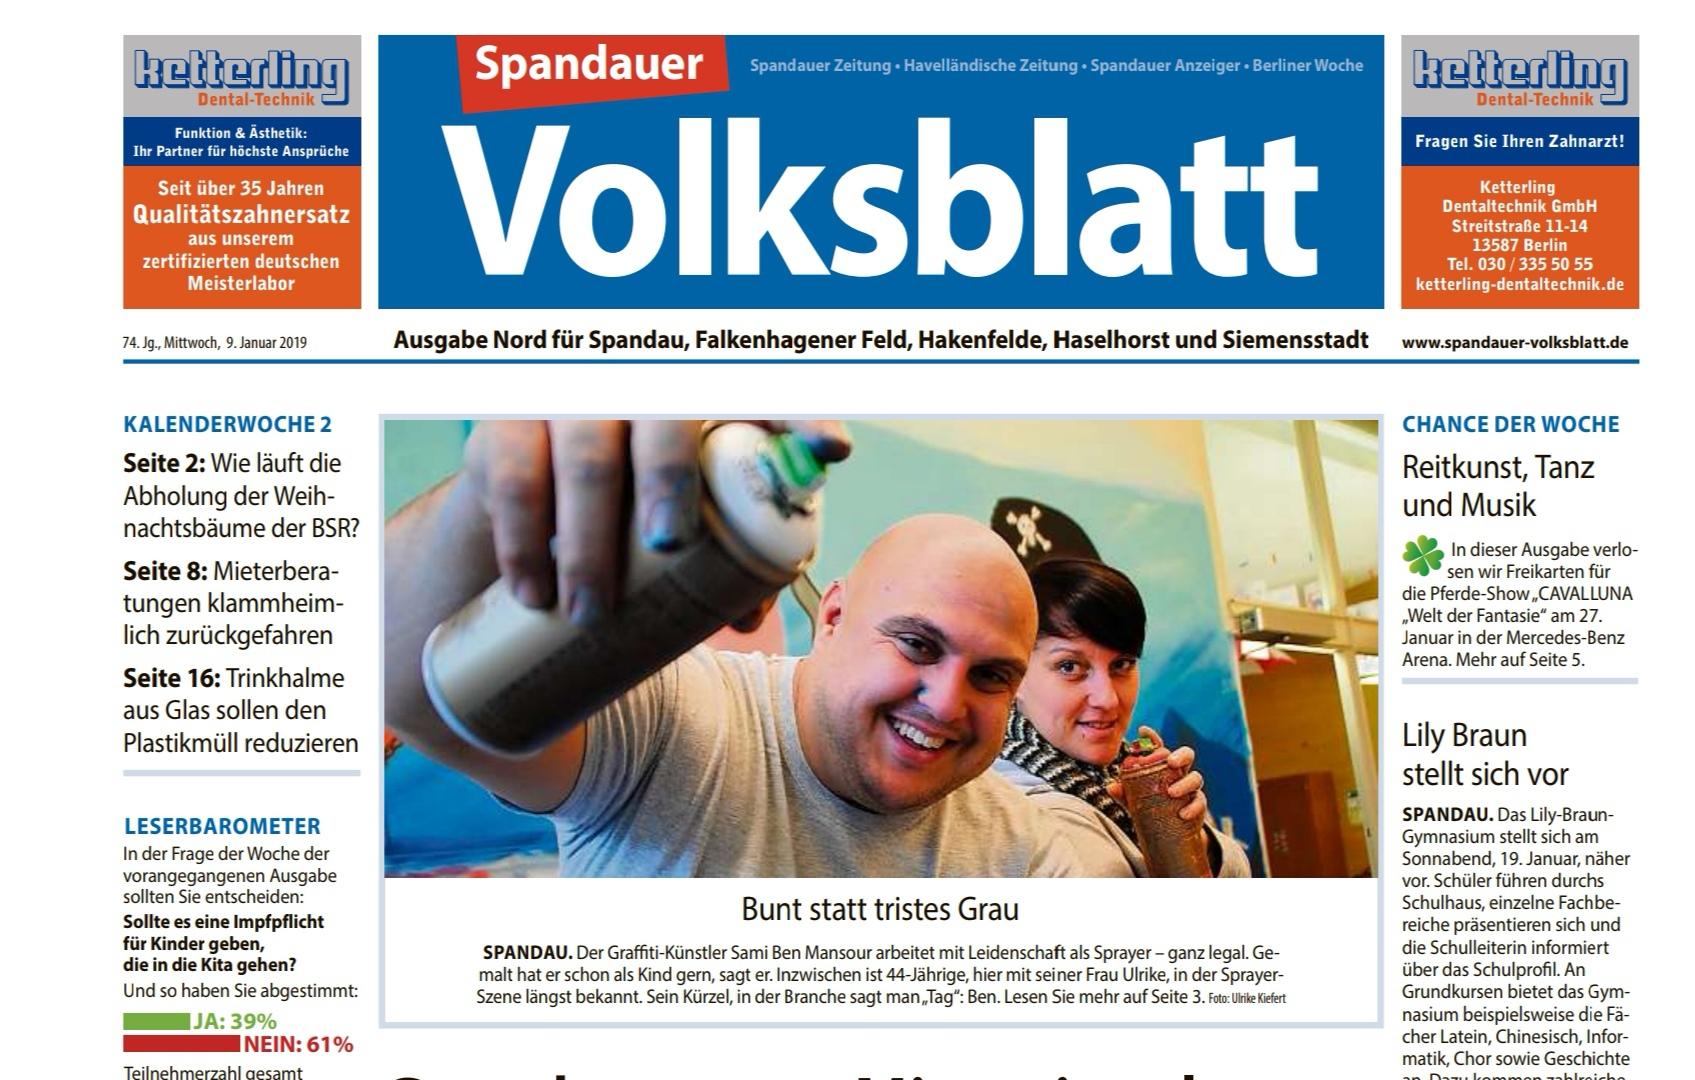 Titelbild-09-01-19-volksblatt-detail